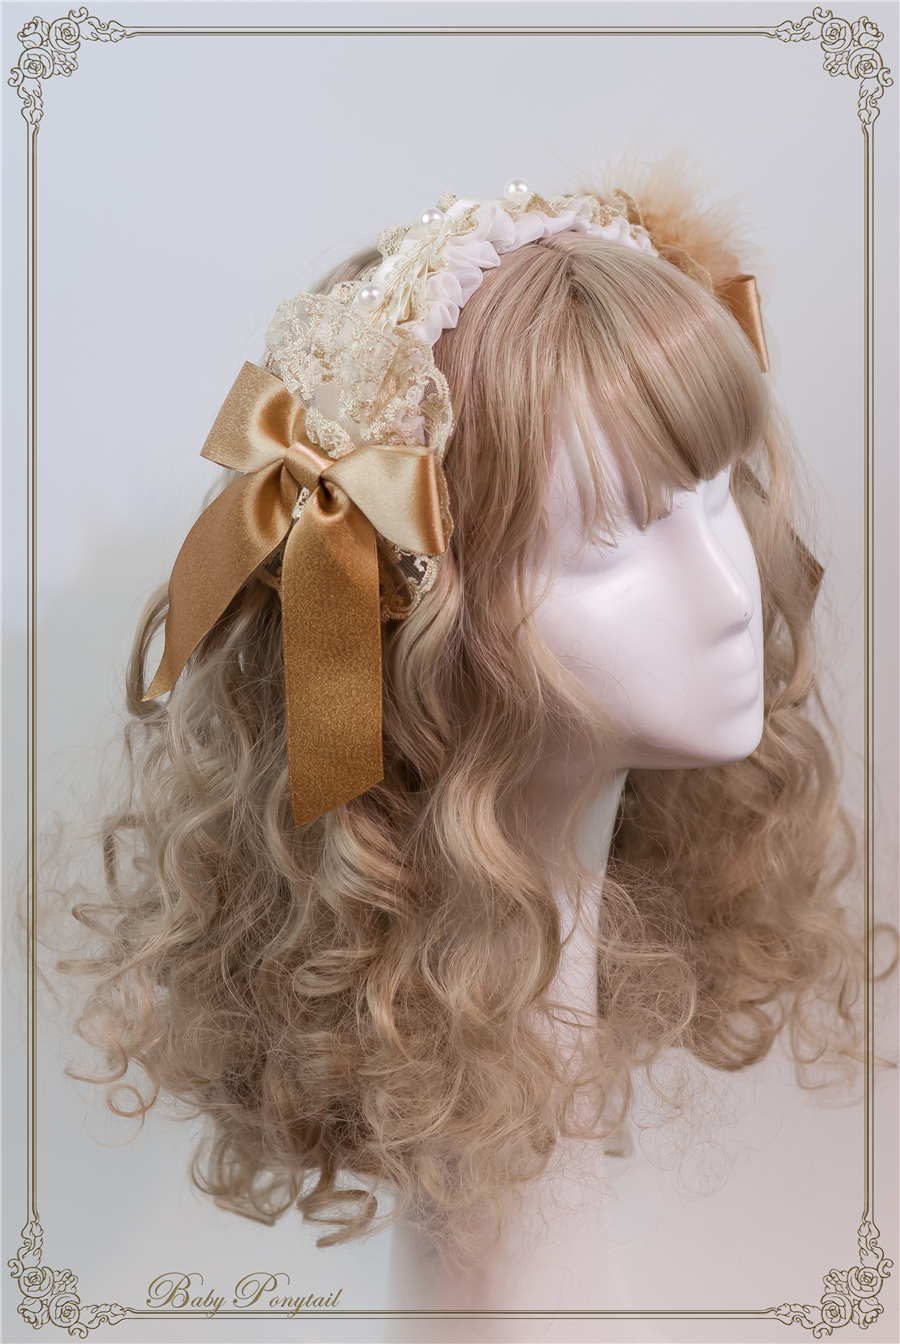 Baby Ponytail_Stock photo_Circus Princess_Rose Head Dress Golden_07.jpg